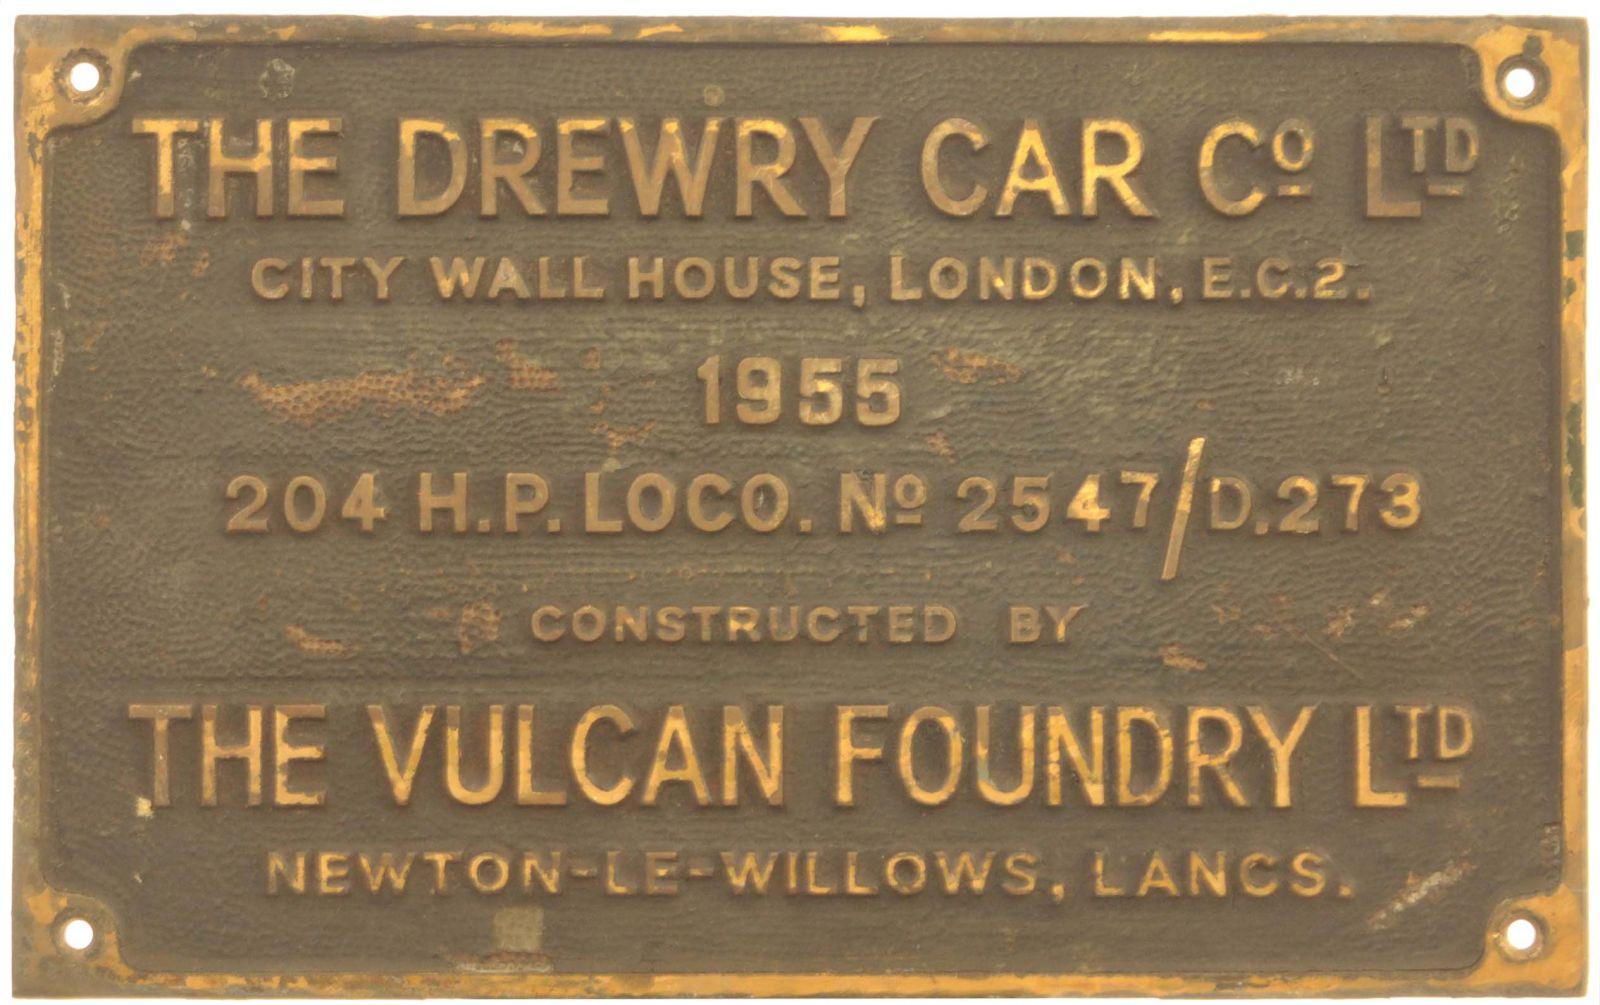 Lot 34 - Railway Locomotive Worksplates (Diesel), Drewry/Vulcan 2547/D273, 1955 (D2224): A worksplate,